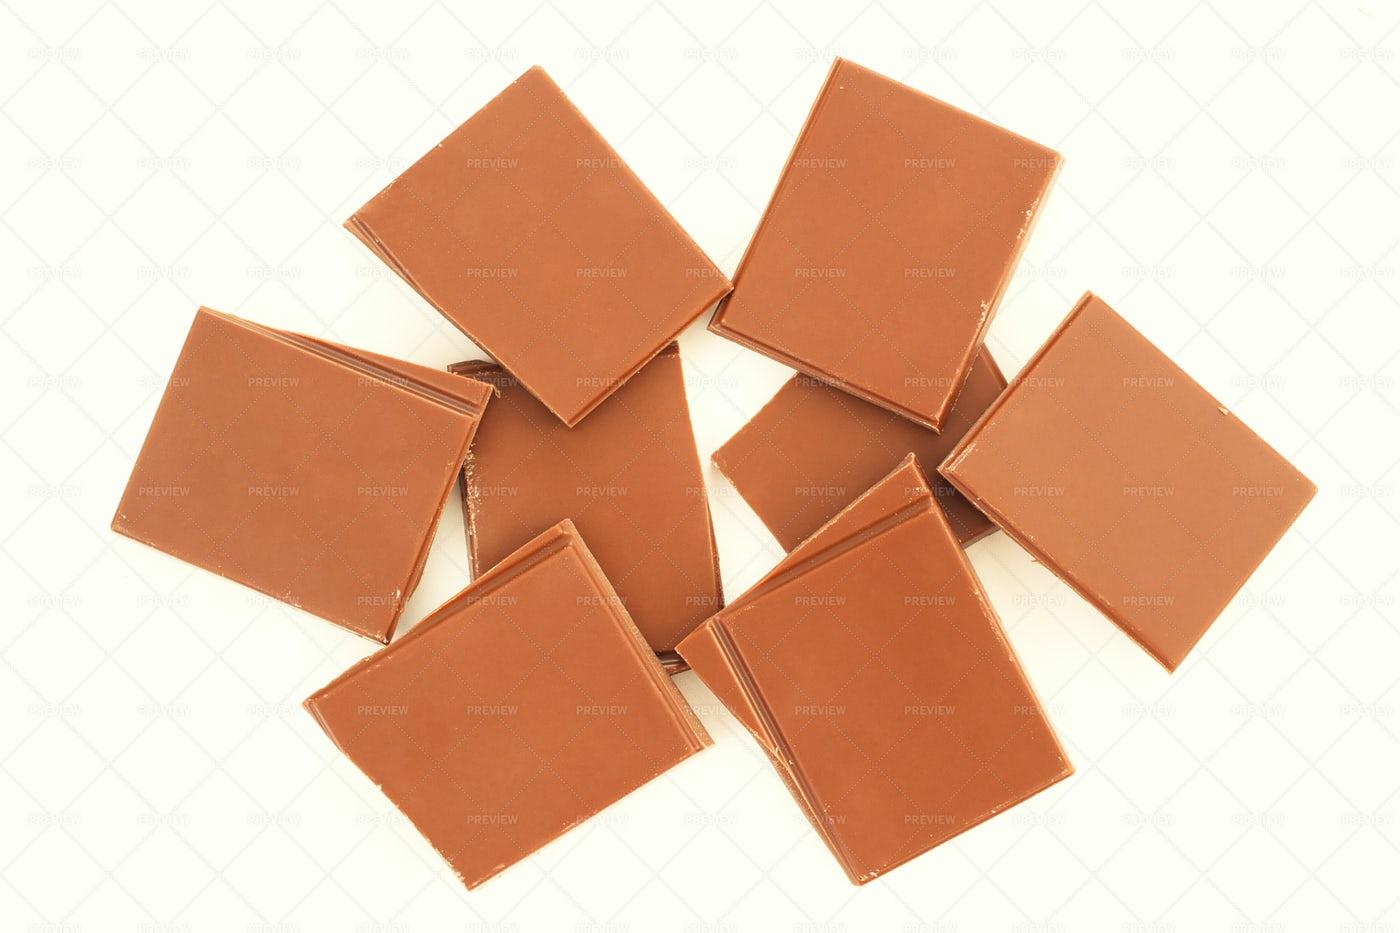 Pieces Of Milk Chocolate: Stock Photos